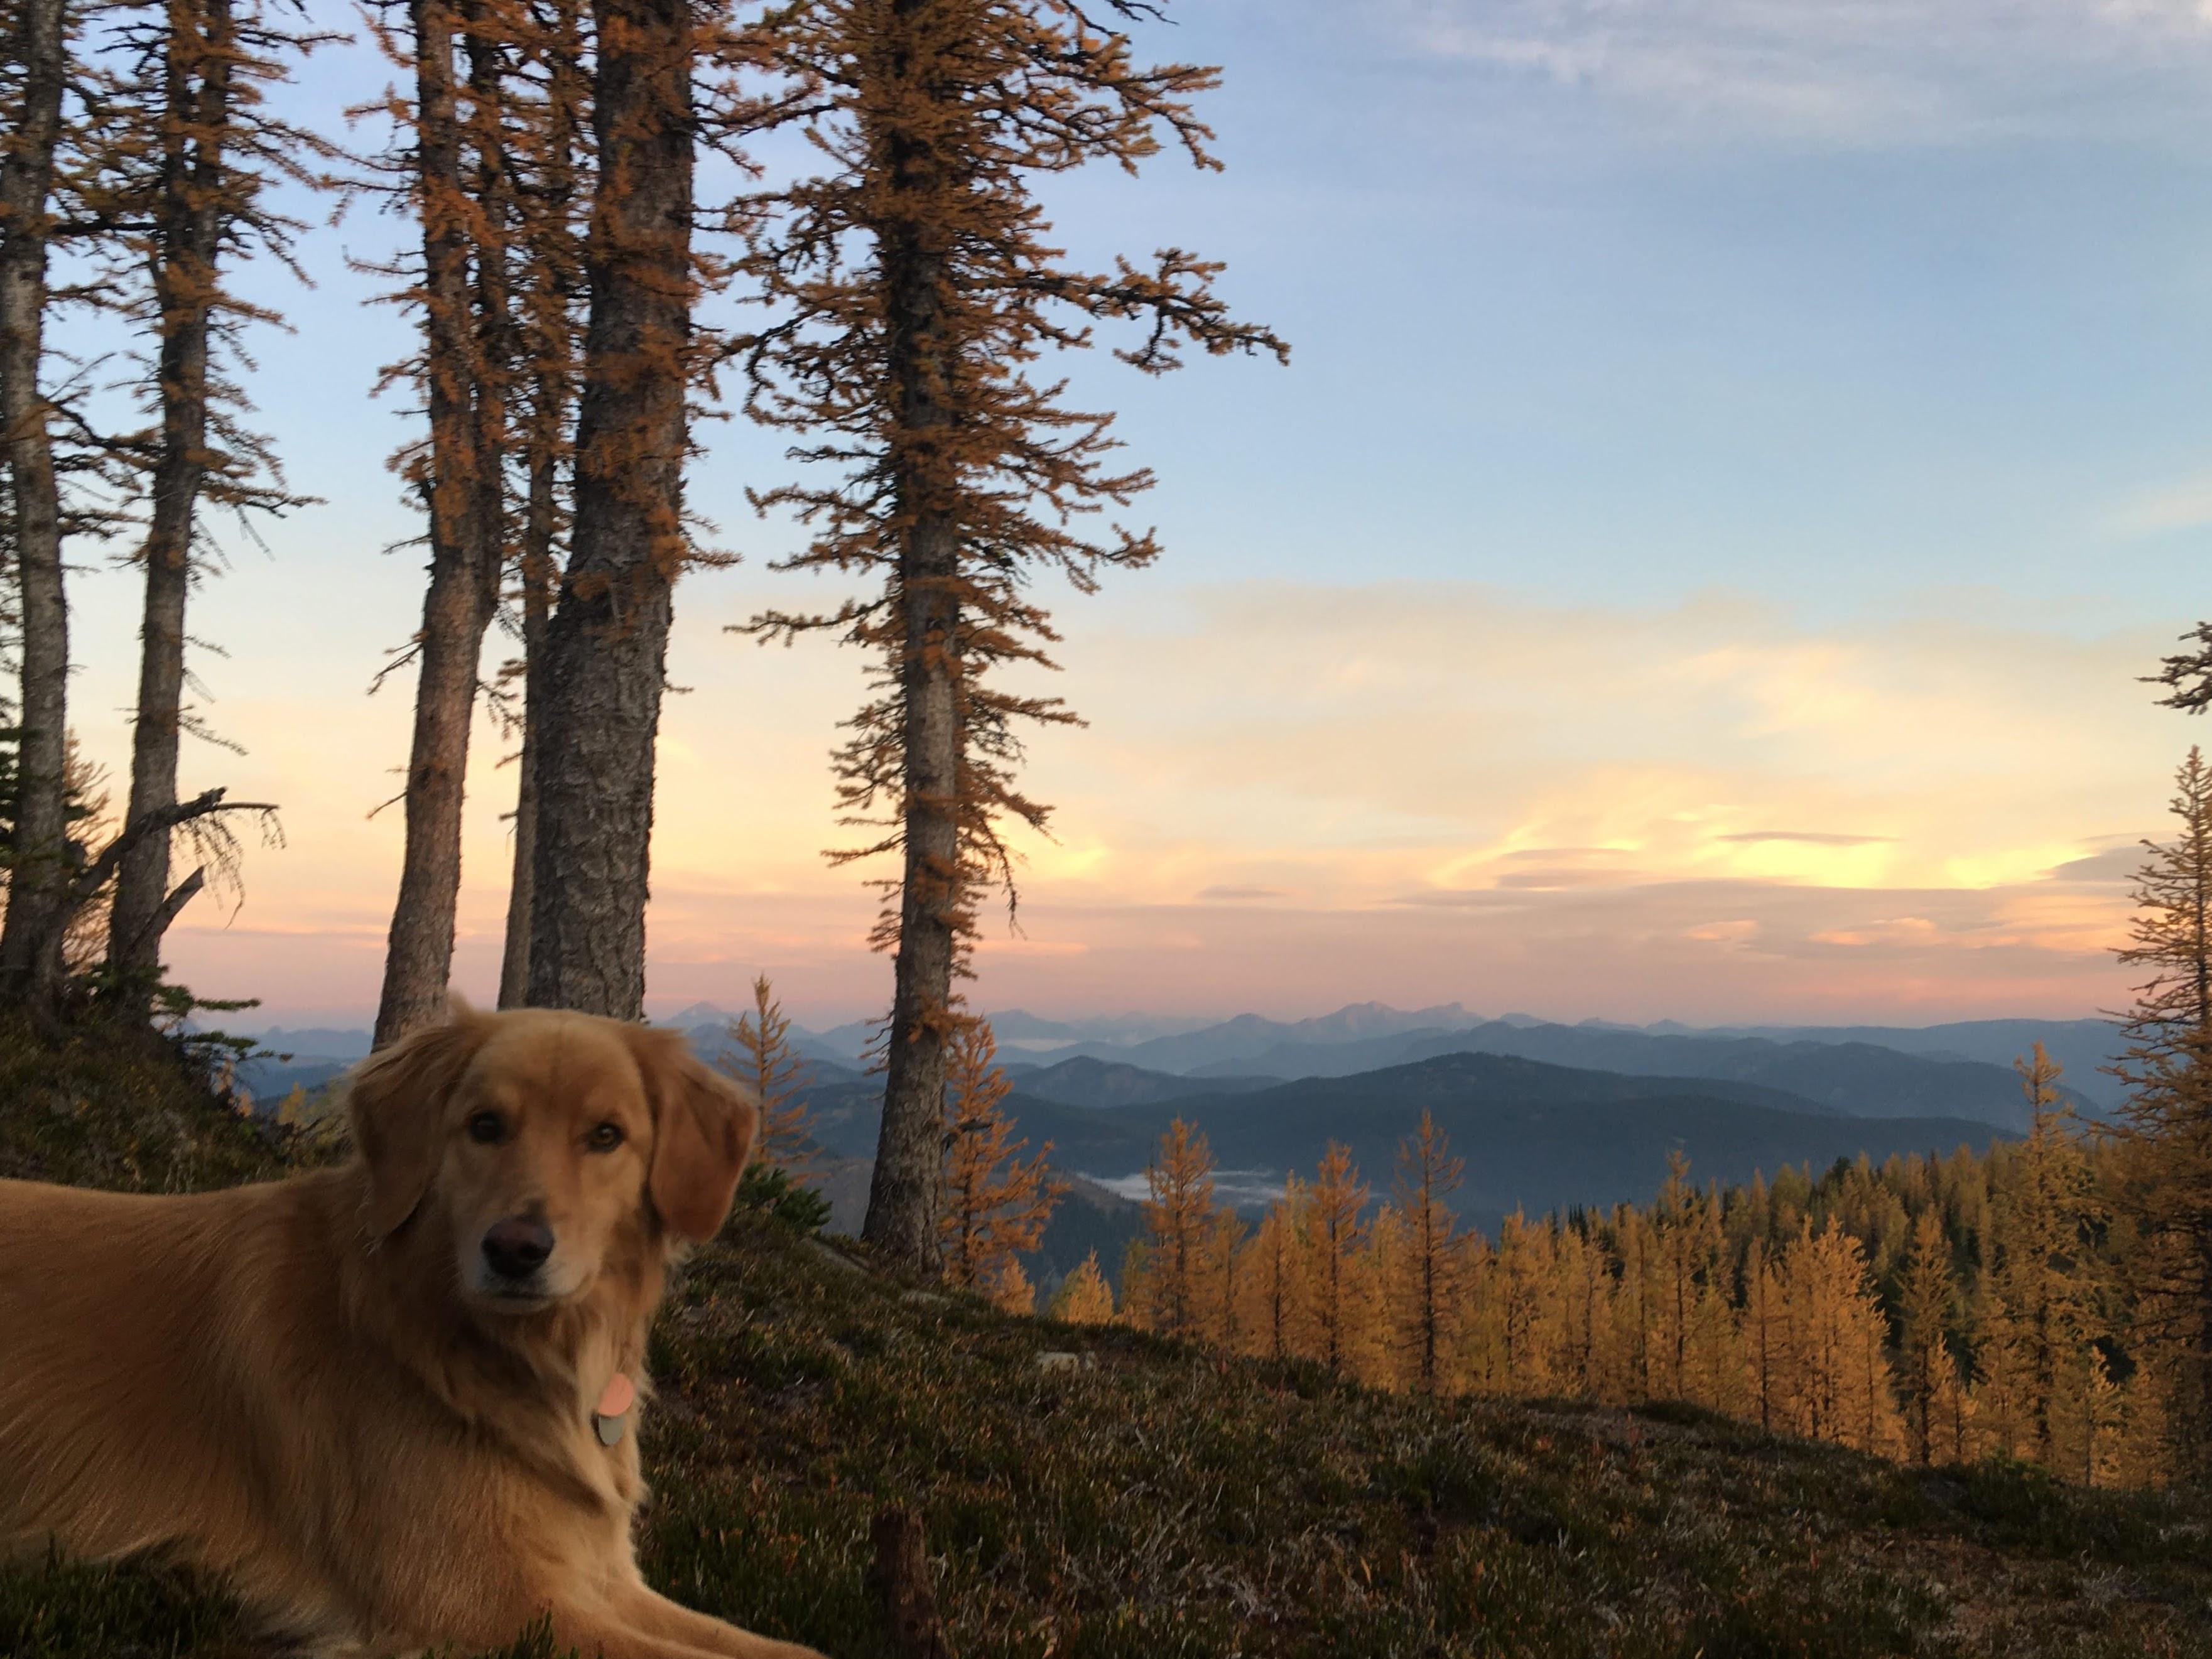 Calmed Buddy in the morning light. Photo by Melissa Bernstein.